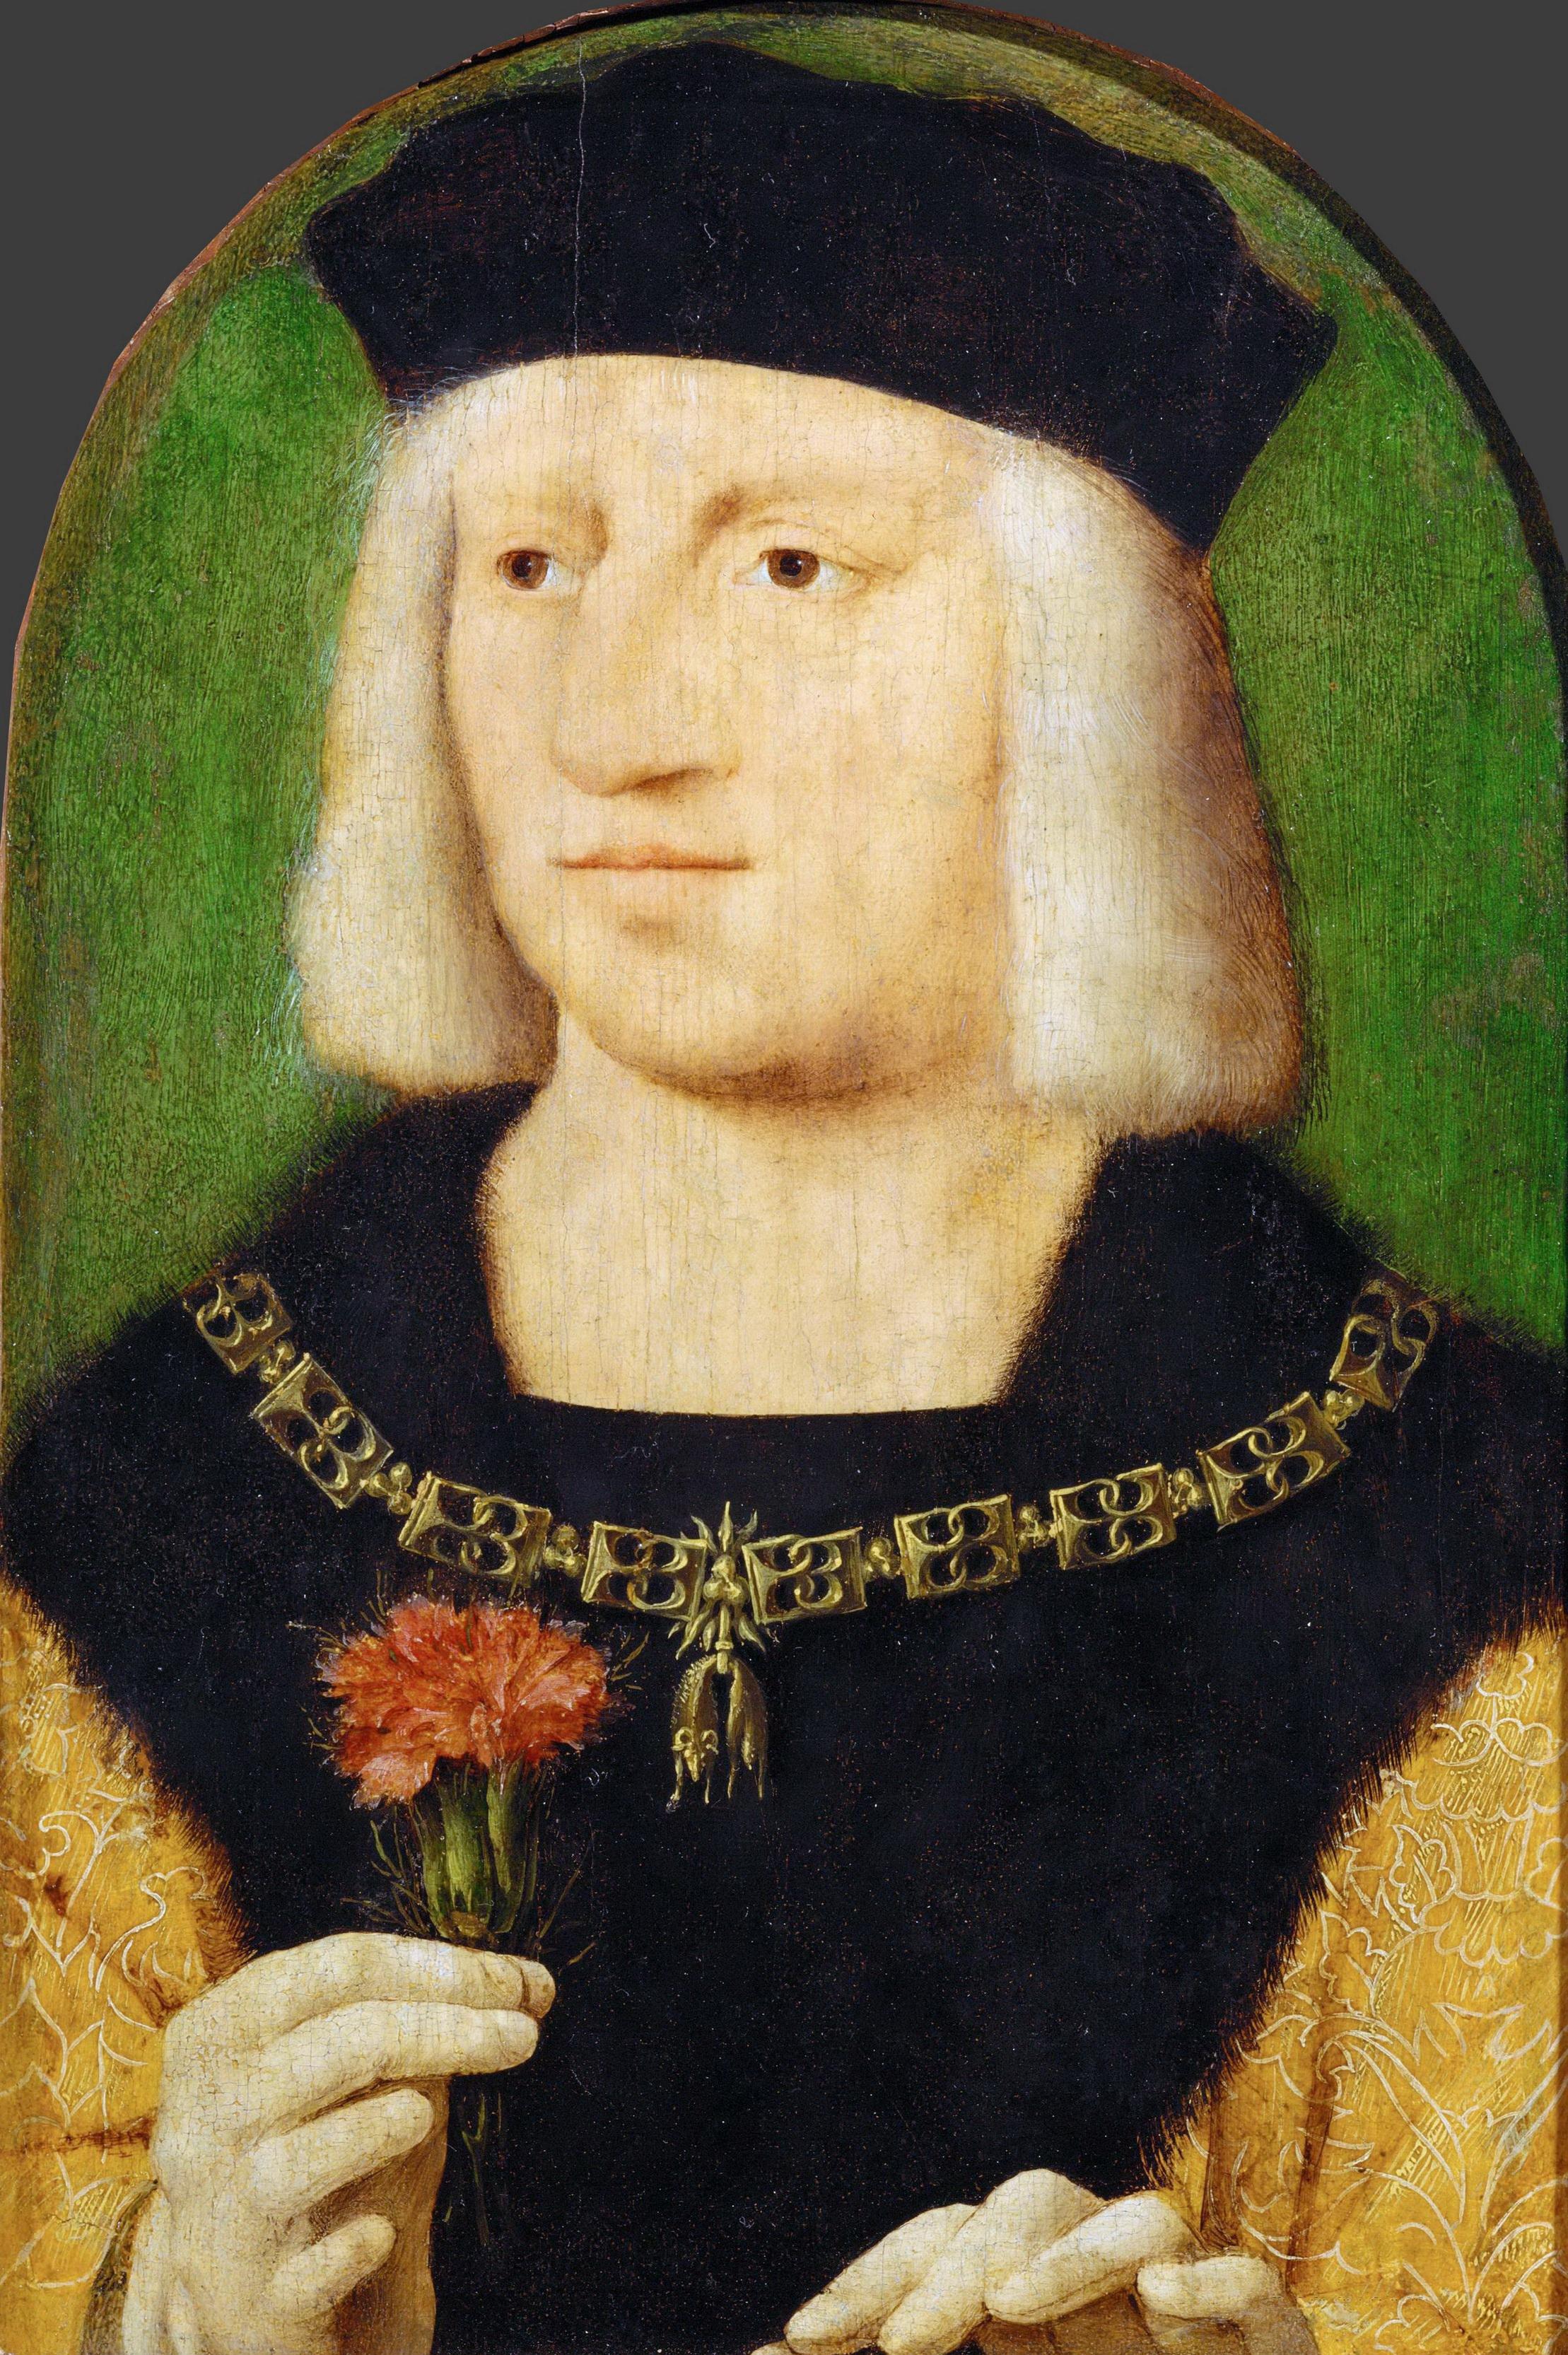 Portrait of Emperor Maximilian I (About 1509) (28 x 22) (Wien)